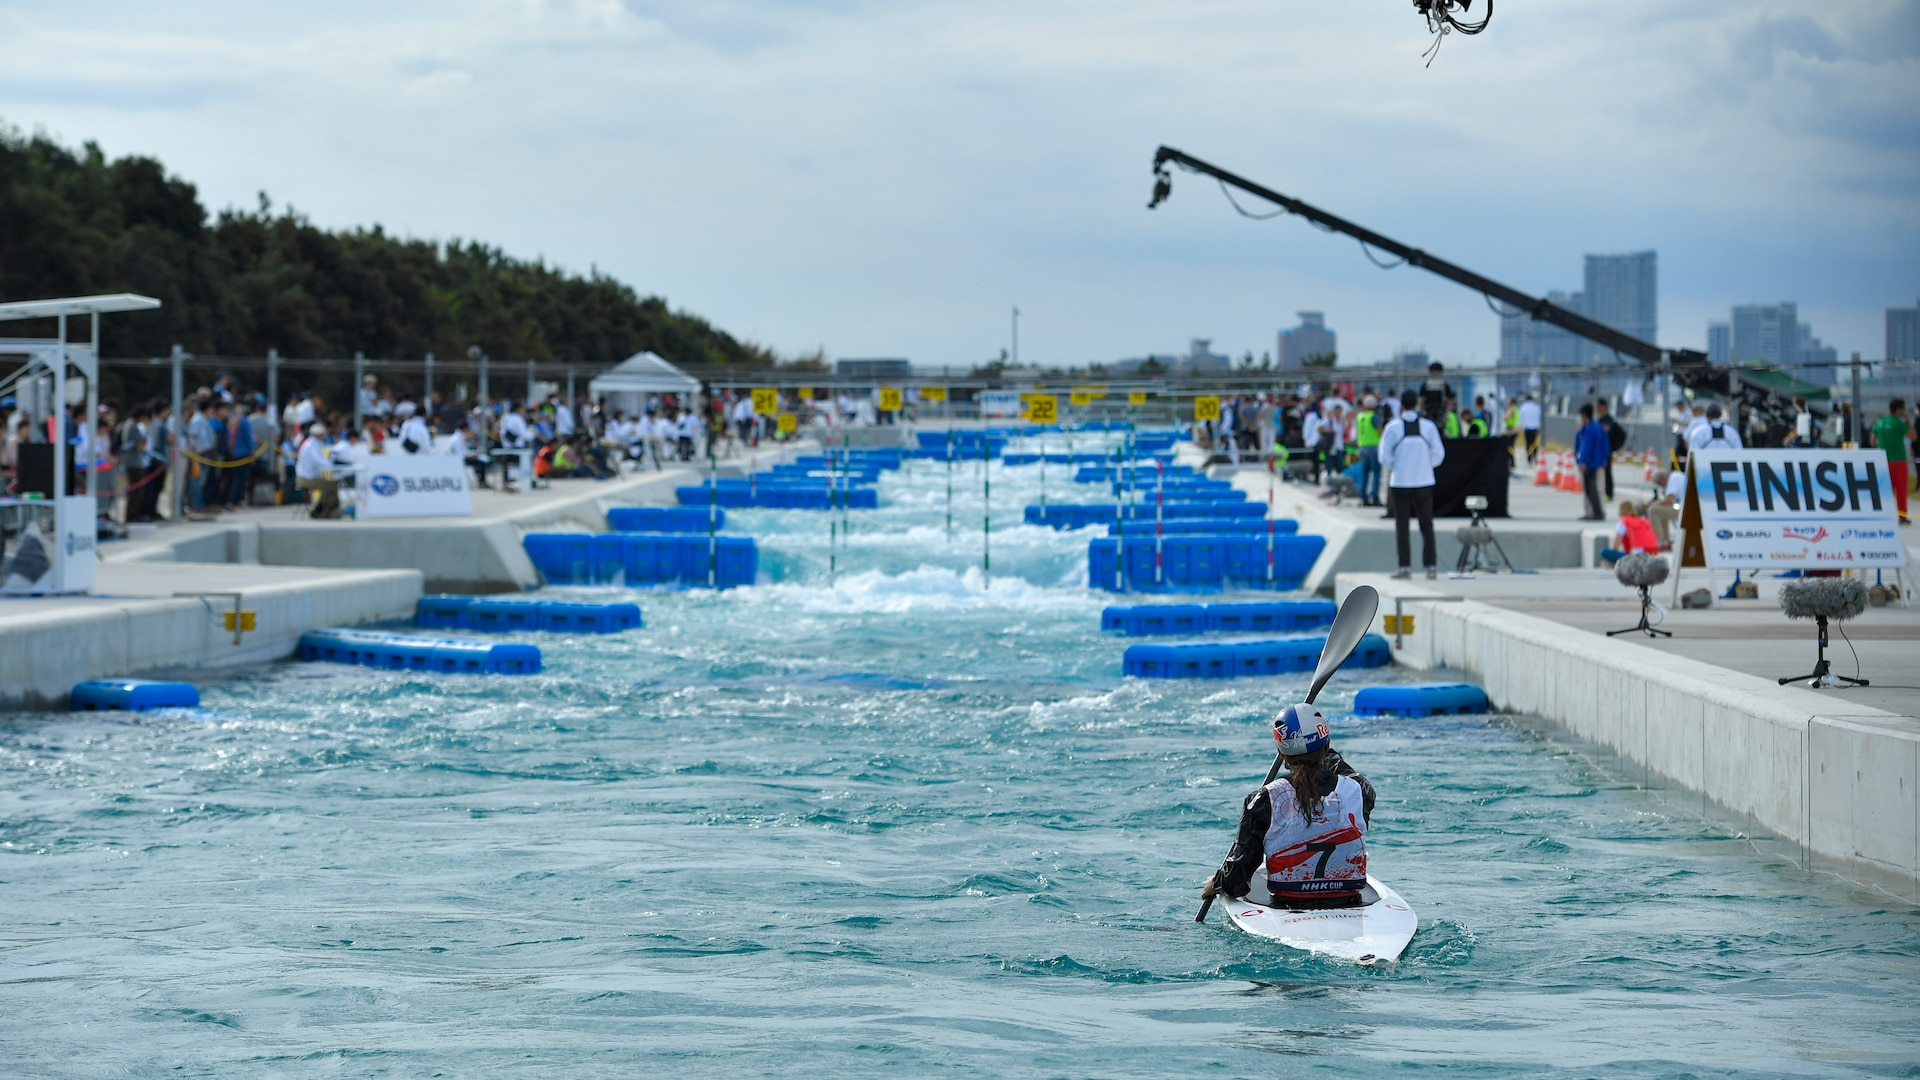 Kasai Canoe Slalom Center